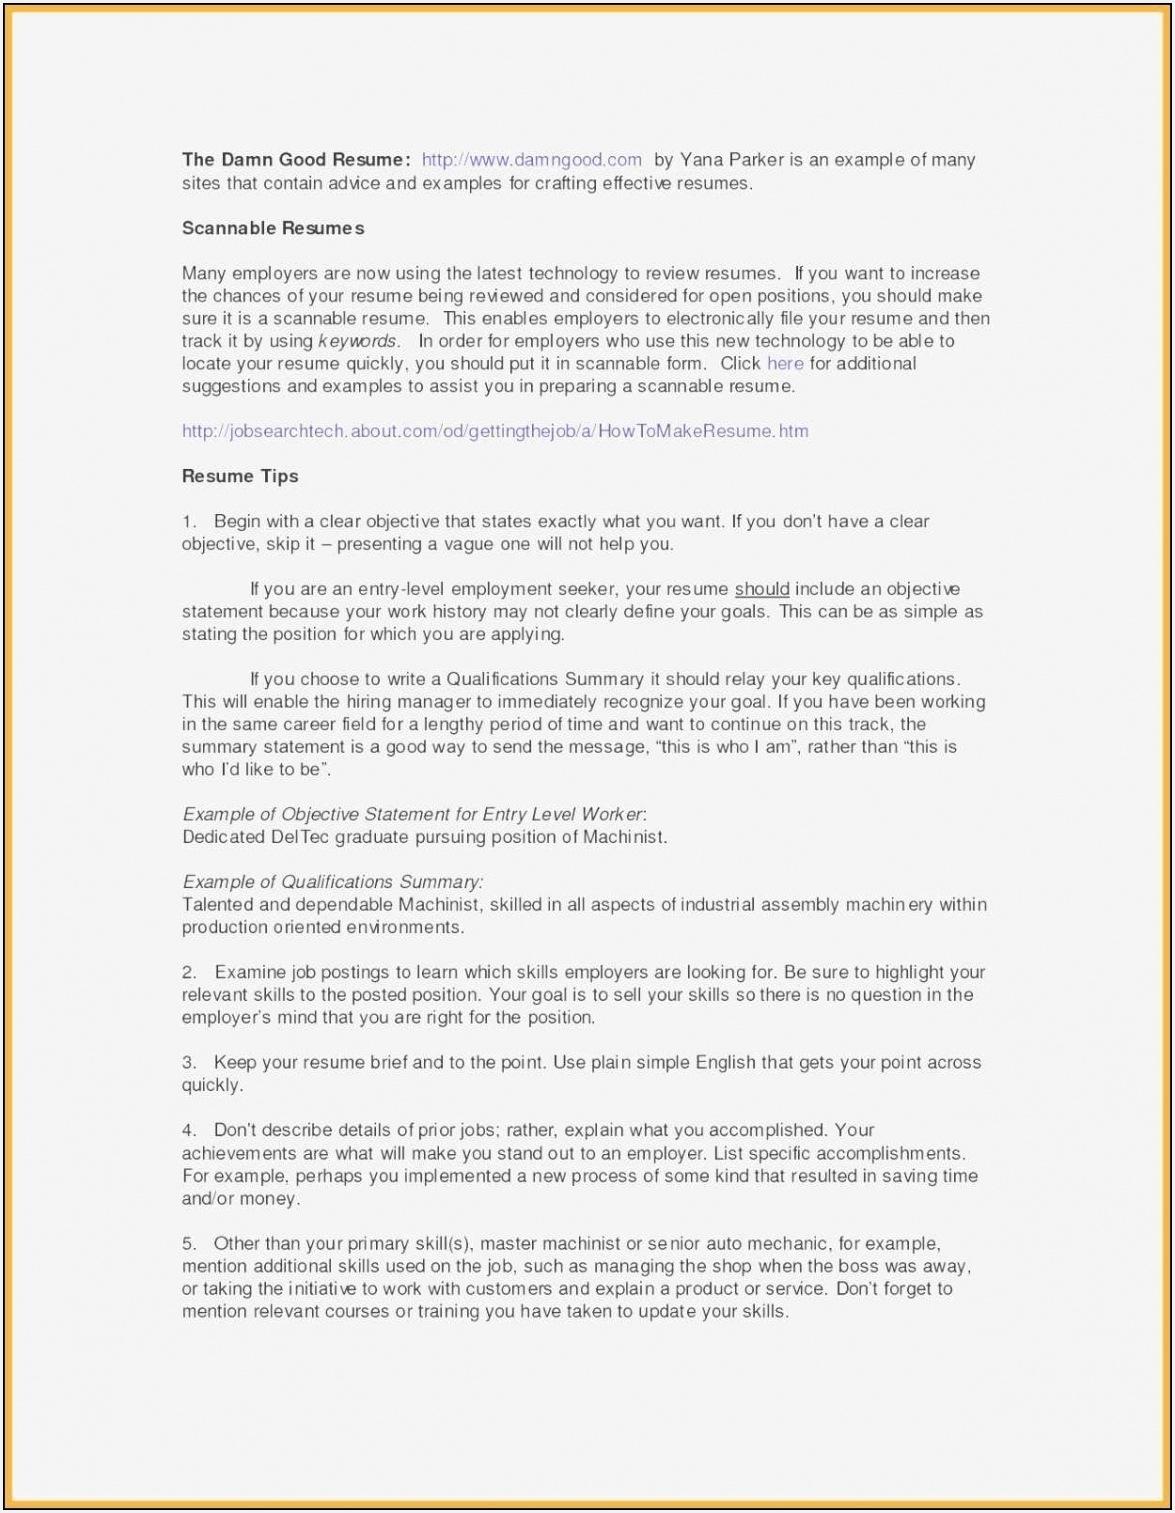 Mechanical Engineer Resume Templates Inspirational Sample Resume Mechanical Engineer Archives Newspb org Valid Sample 15131175drjye